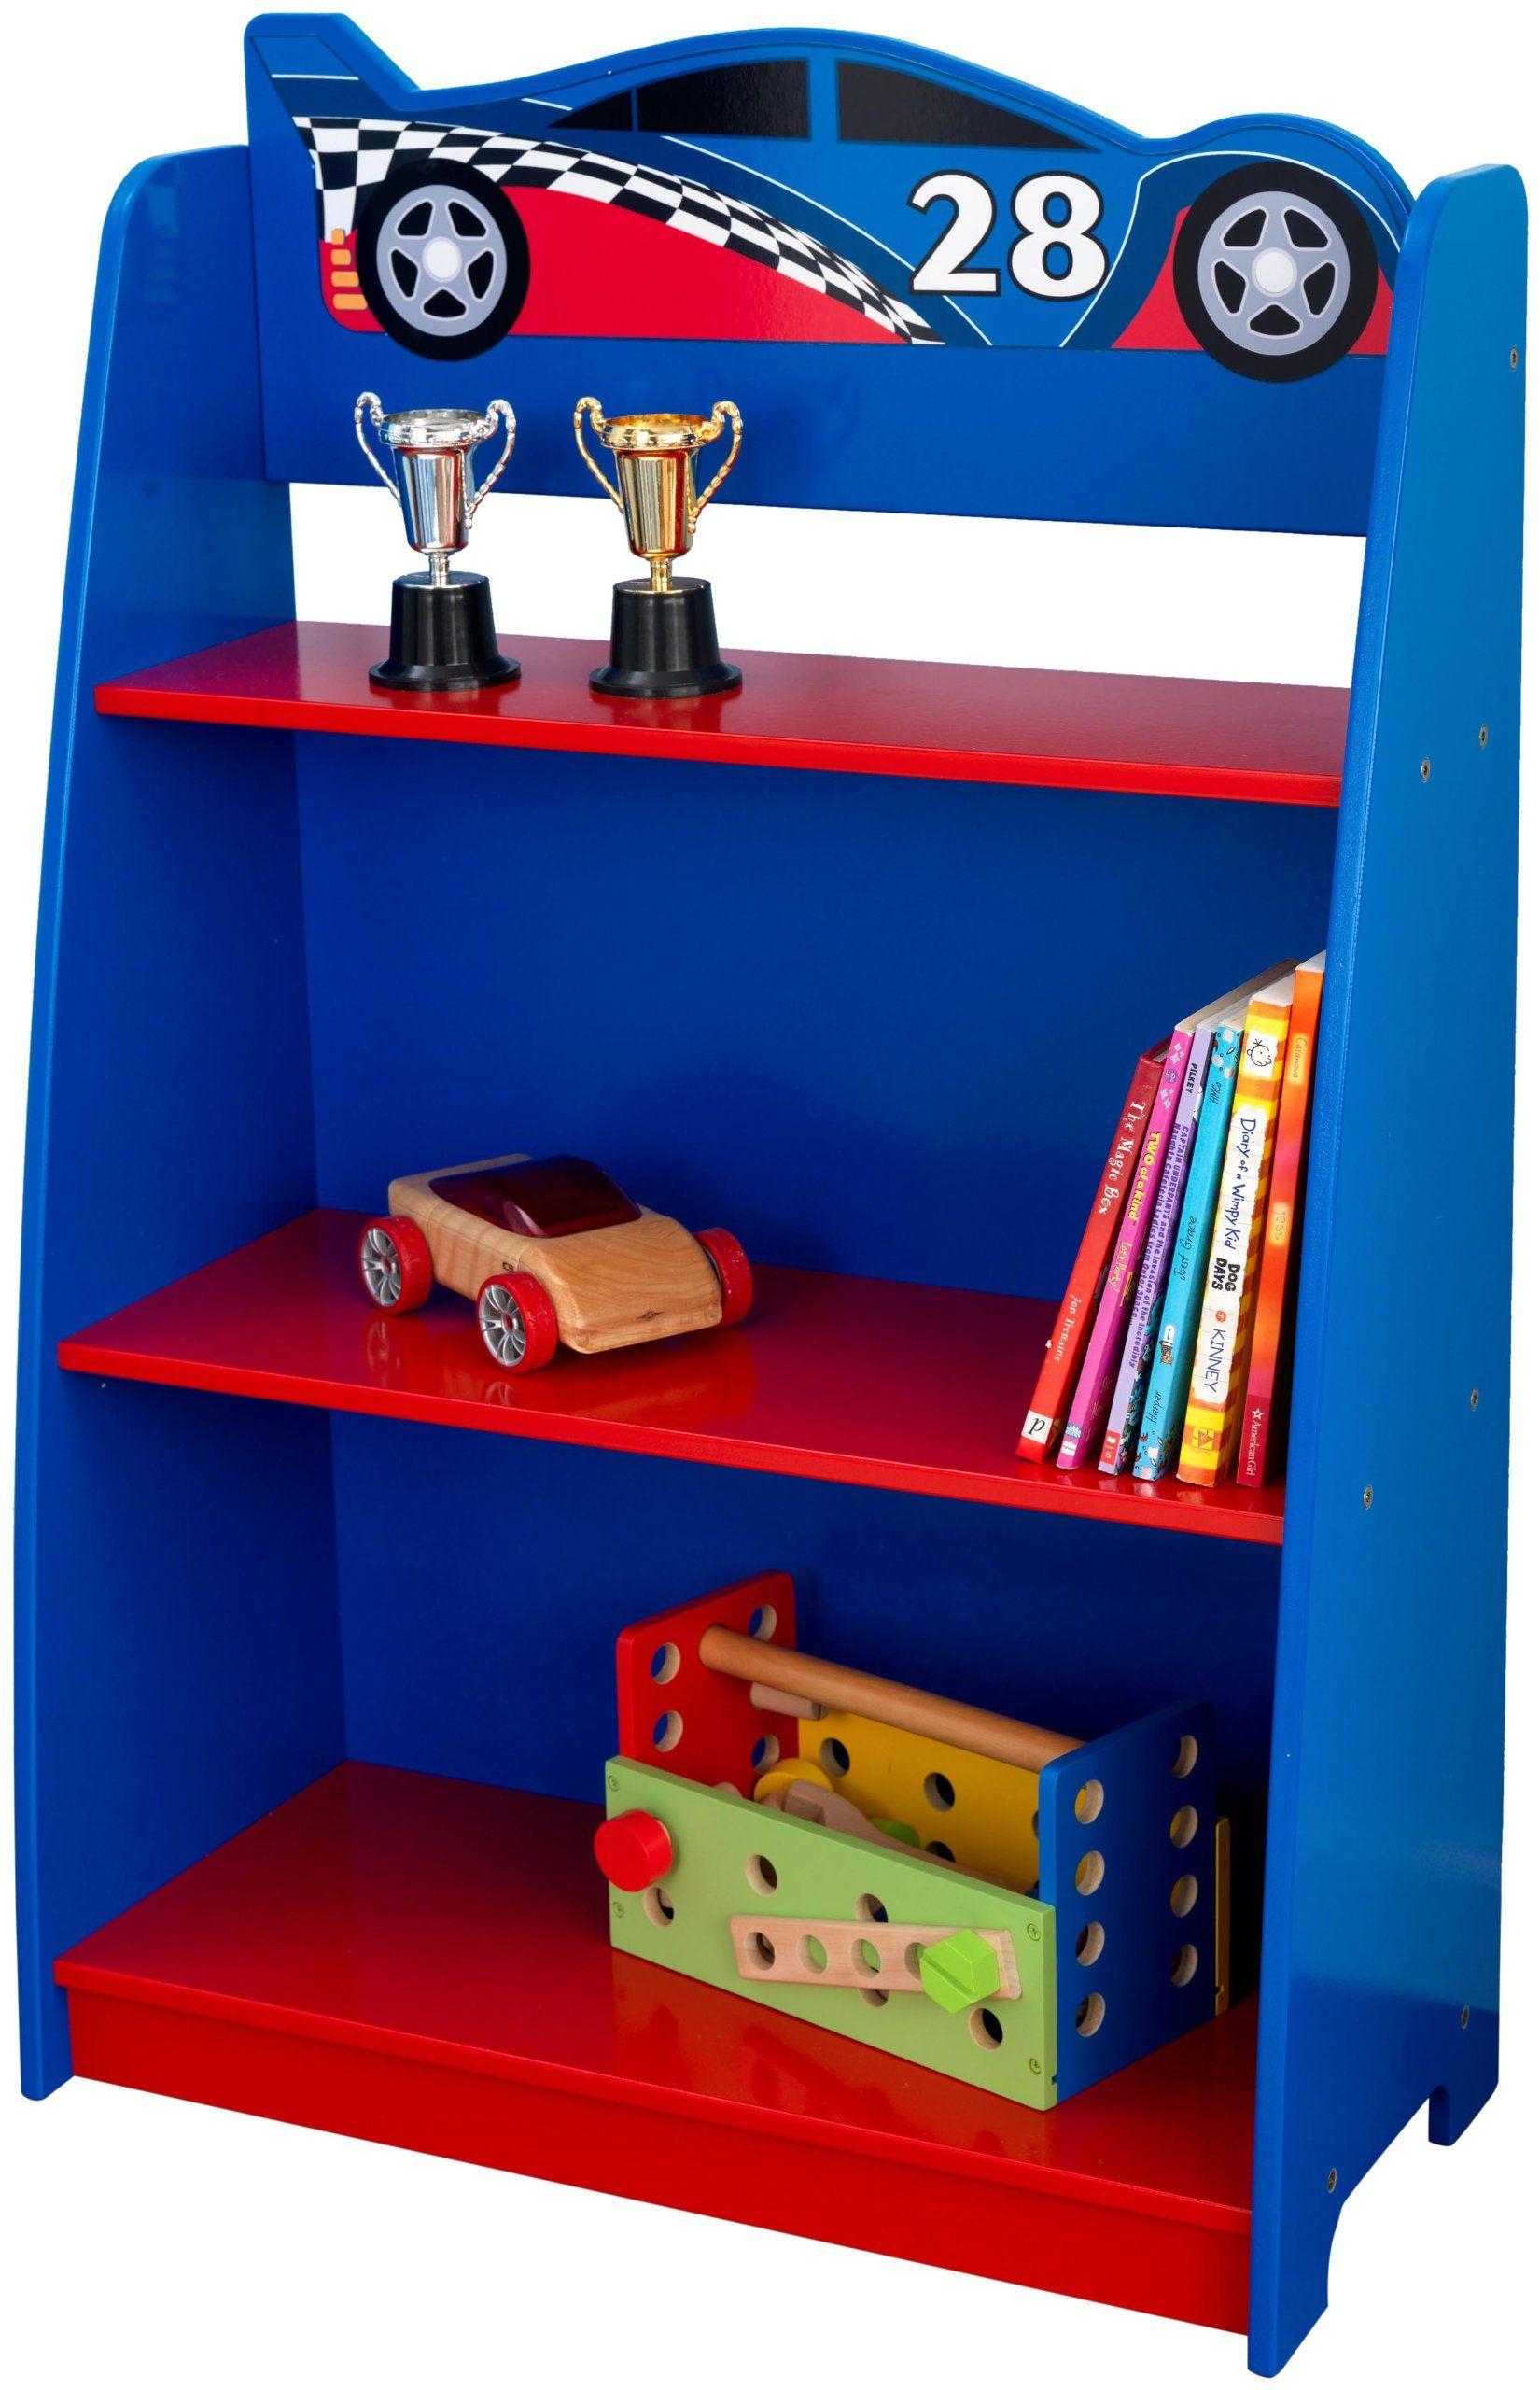 65.99, KidKraft Racecar Bookcase Kids bedroom decor